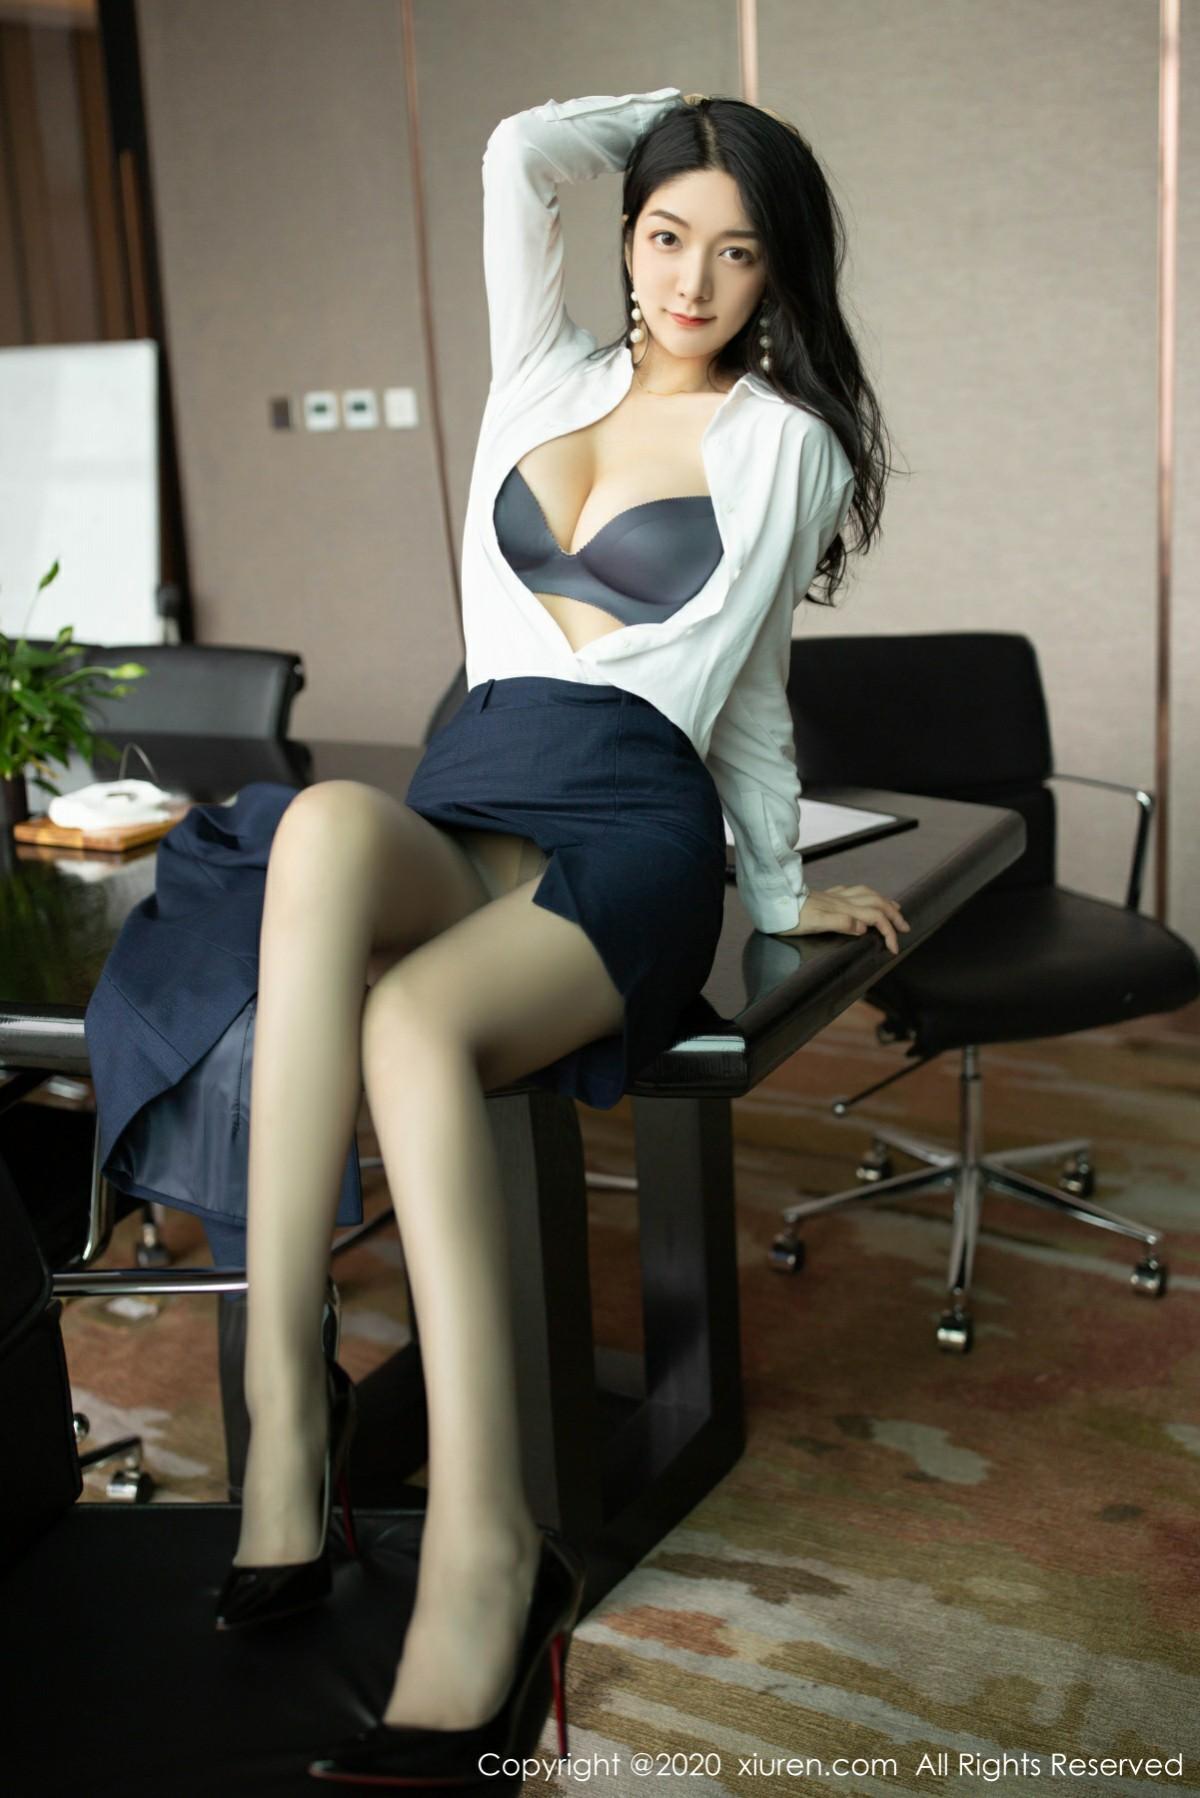 [XiuRen秀人网]2020.03.12 No.2056 Angela小热巴[60P] 秀人网 第1张